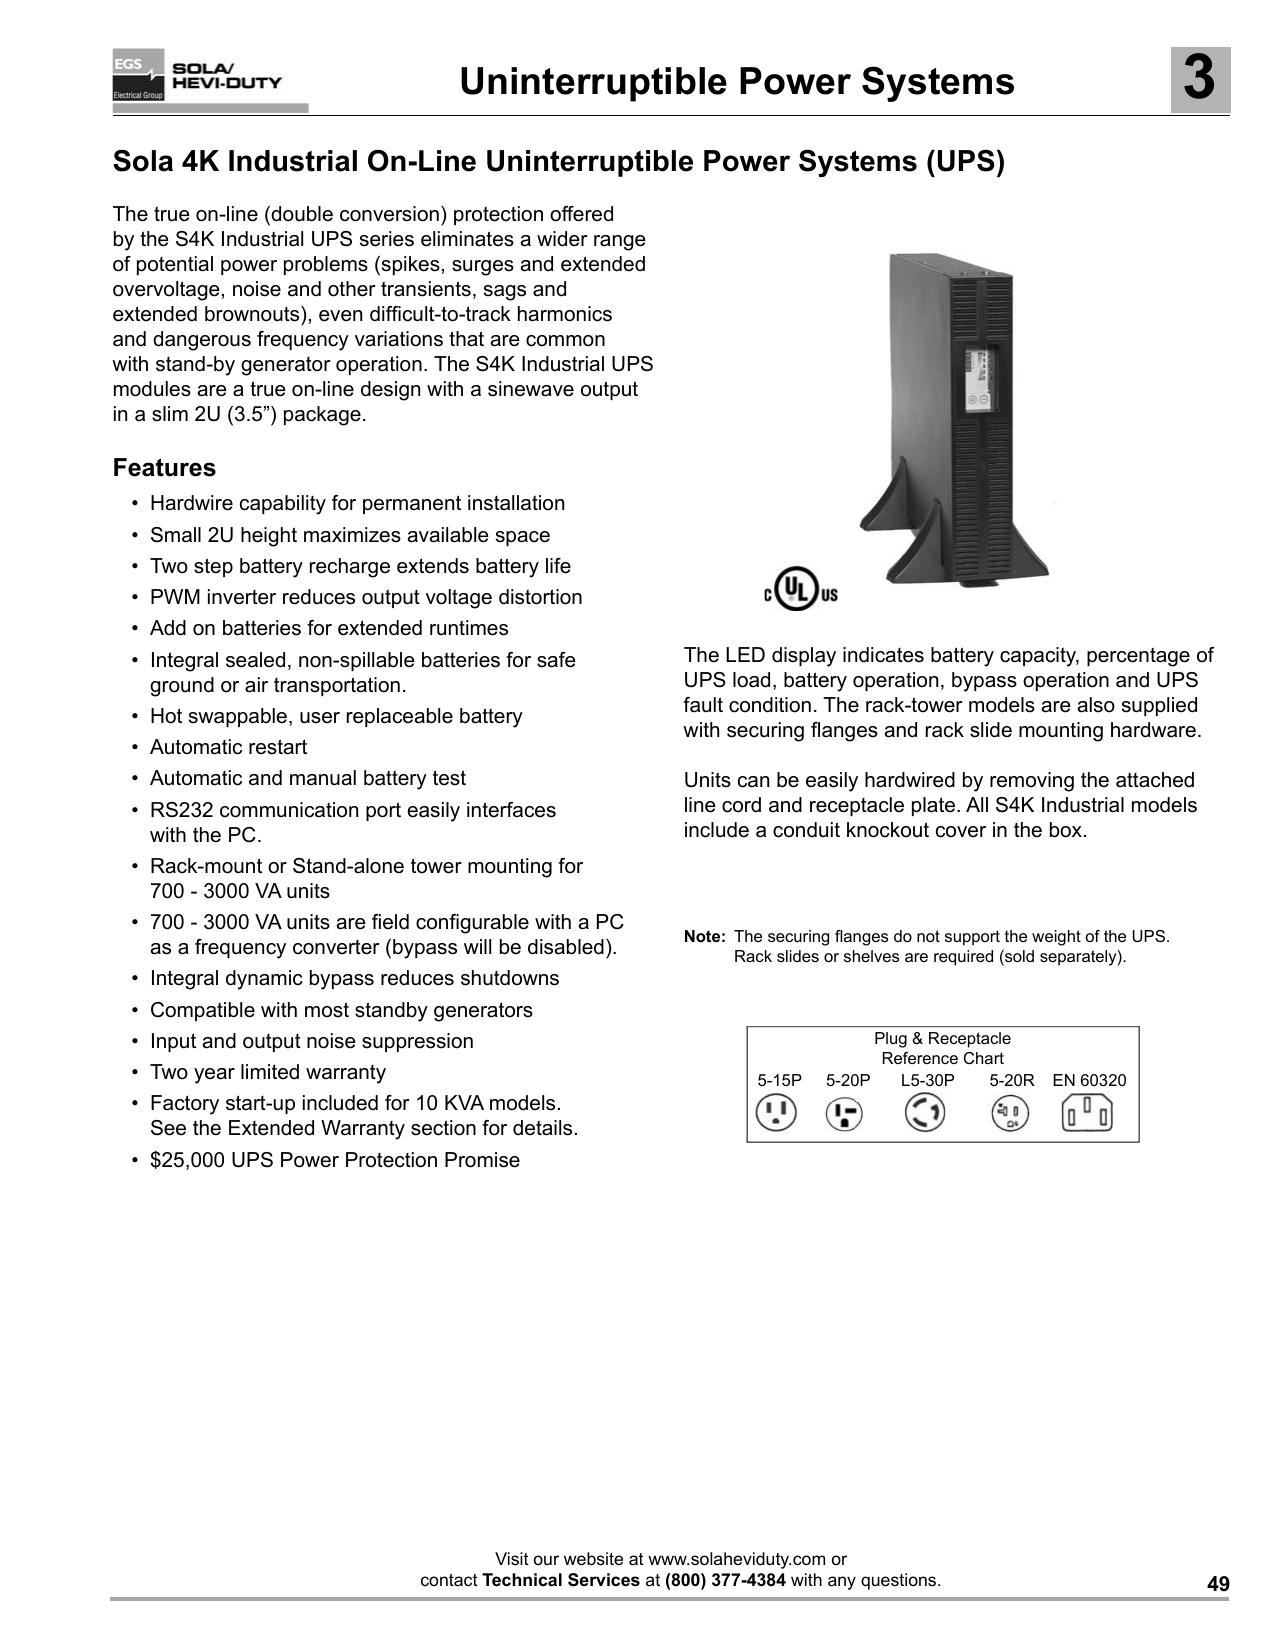 Sola s4k industrial ups manual